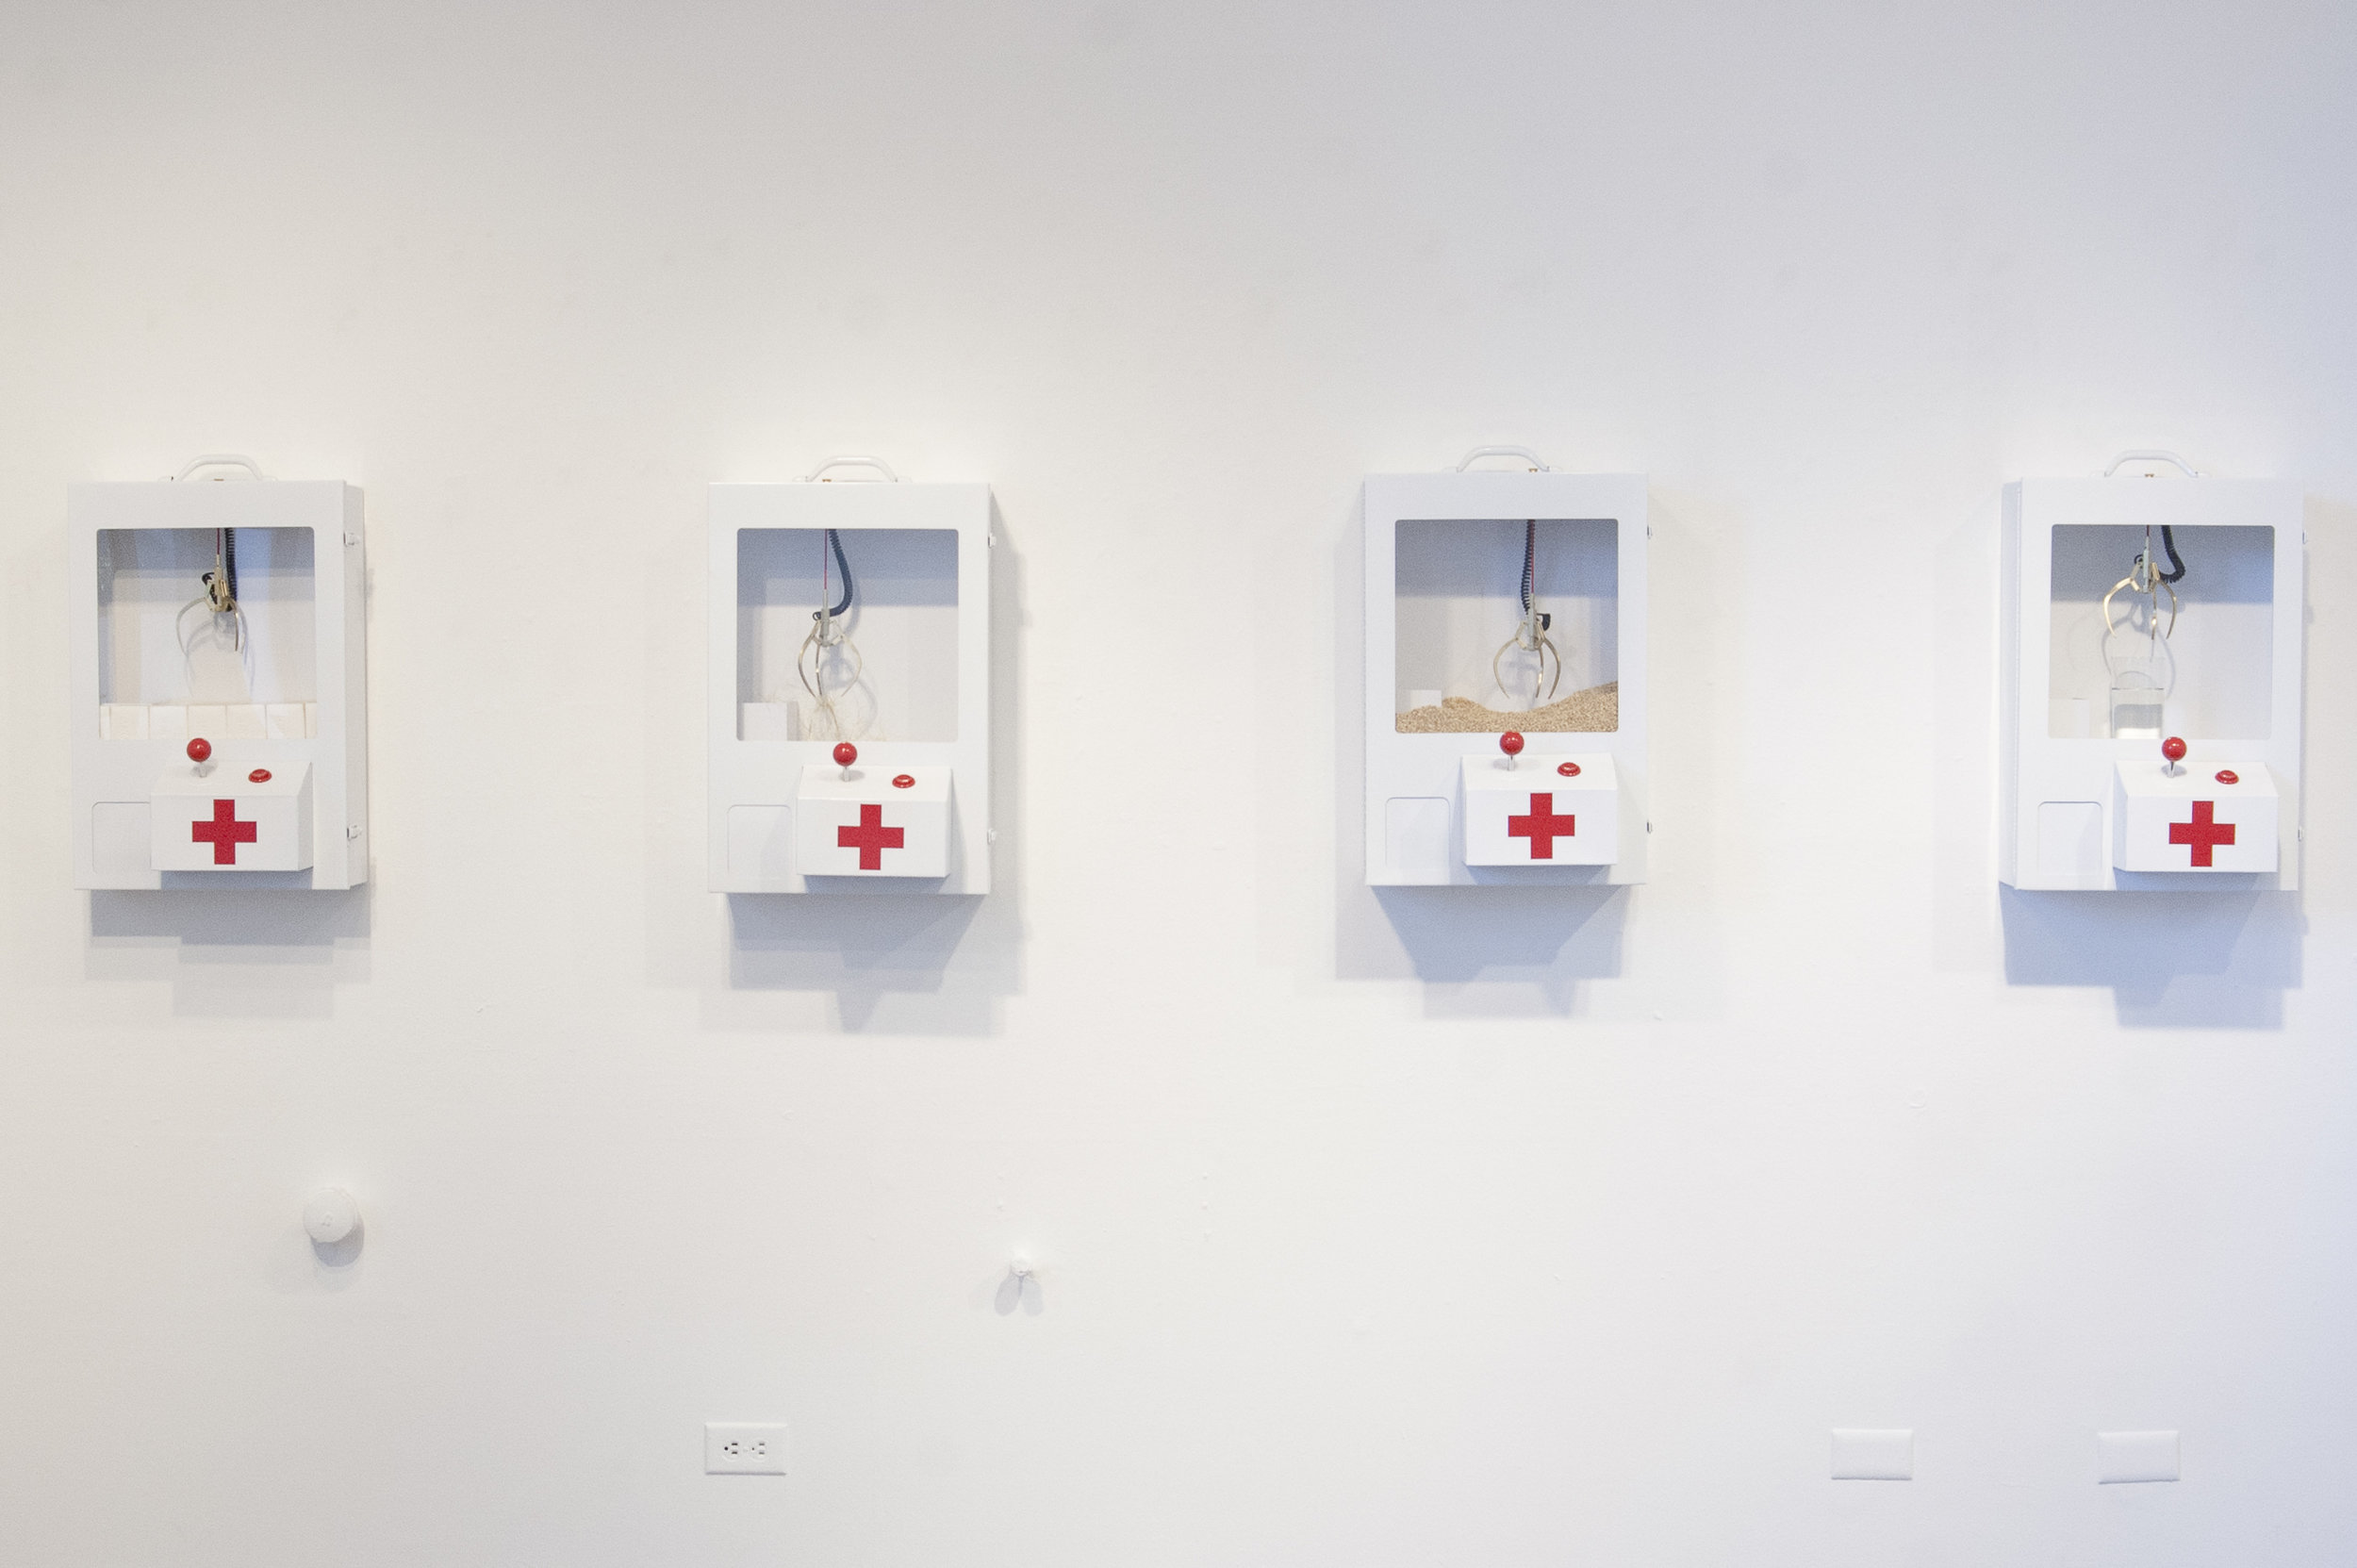 1. First Aid: Pestilence, War, Famine, and Death